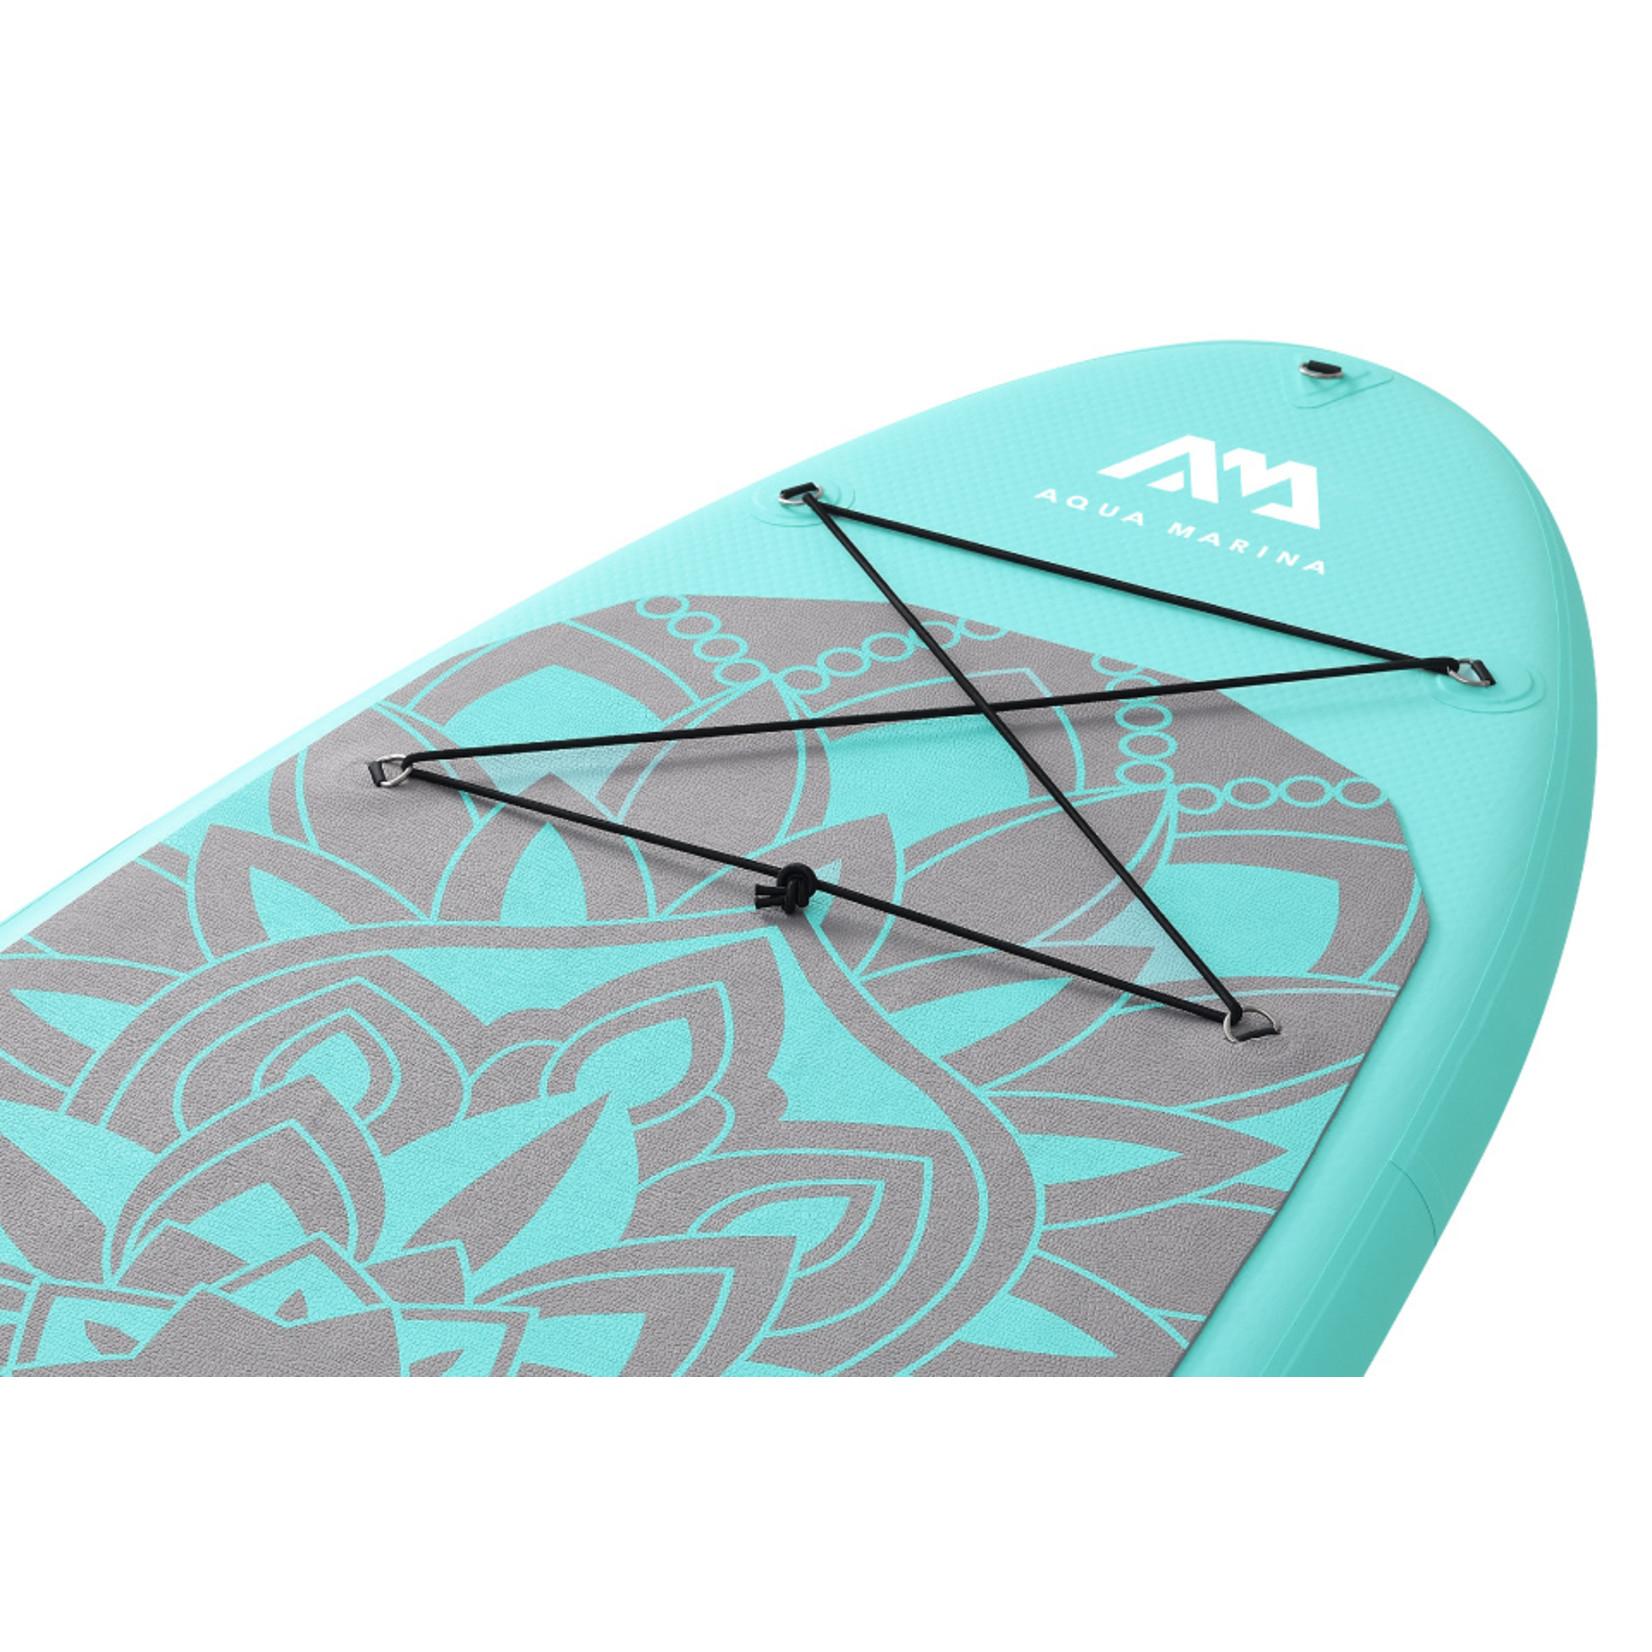 Aqua Marina Dhyana Fitness - Inflatable Fitness Paddle Board